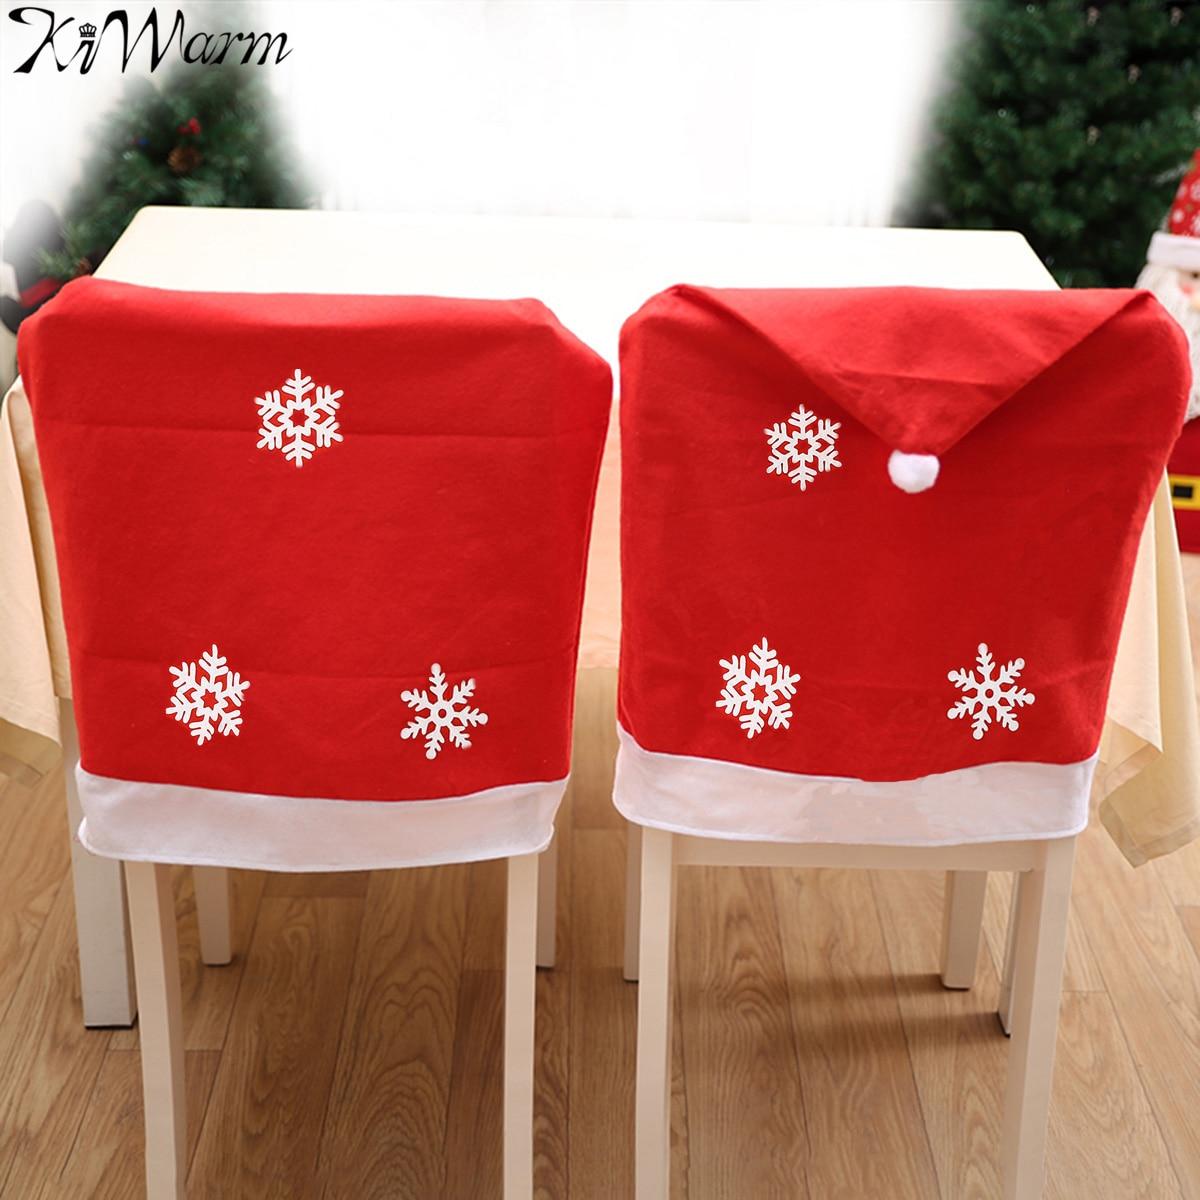 1pcs 50x67cm Christmas Chair Cover Santa Claus Snowflake